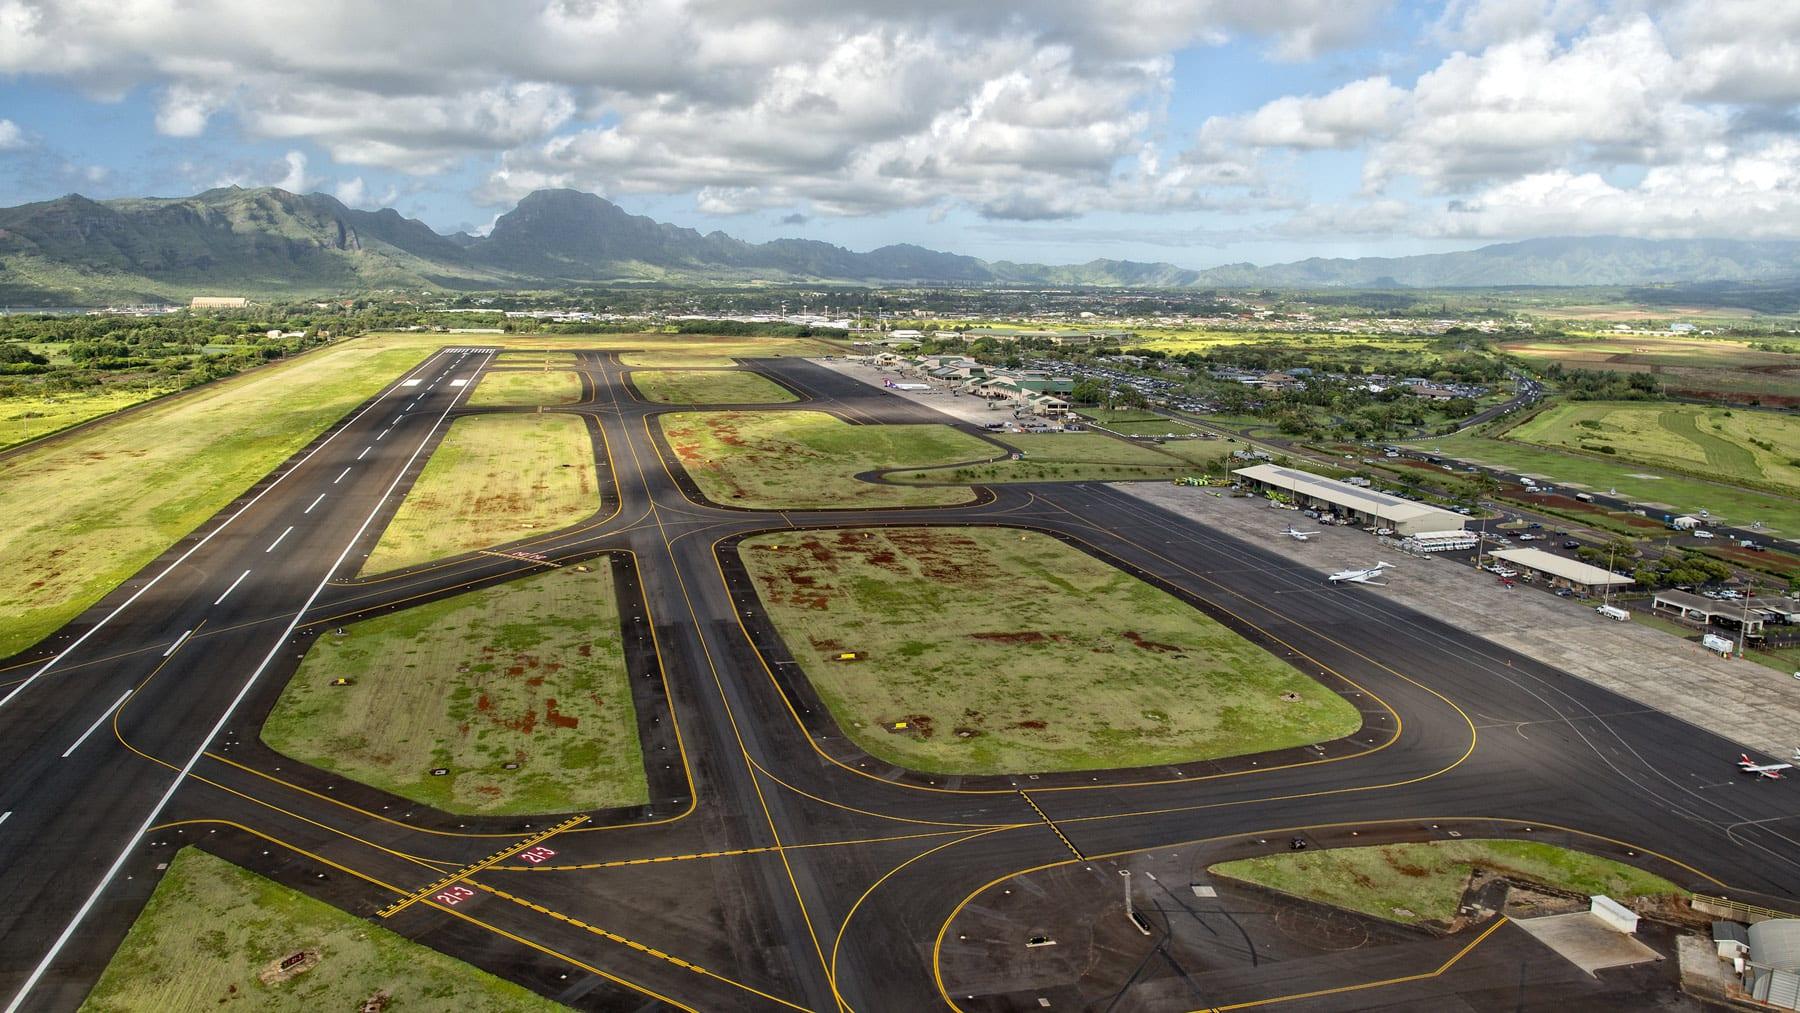 Maui Airport